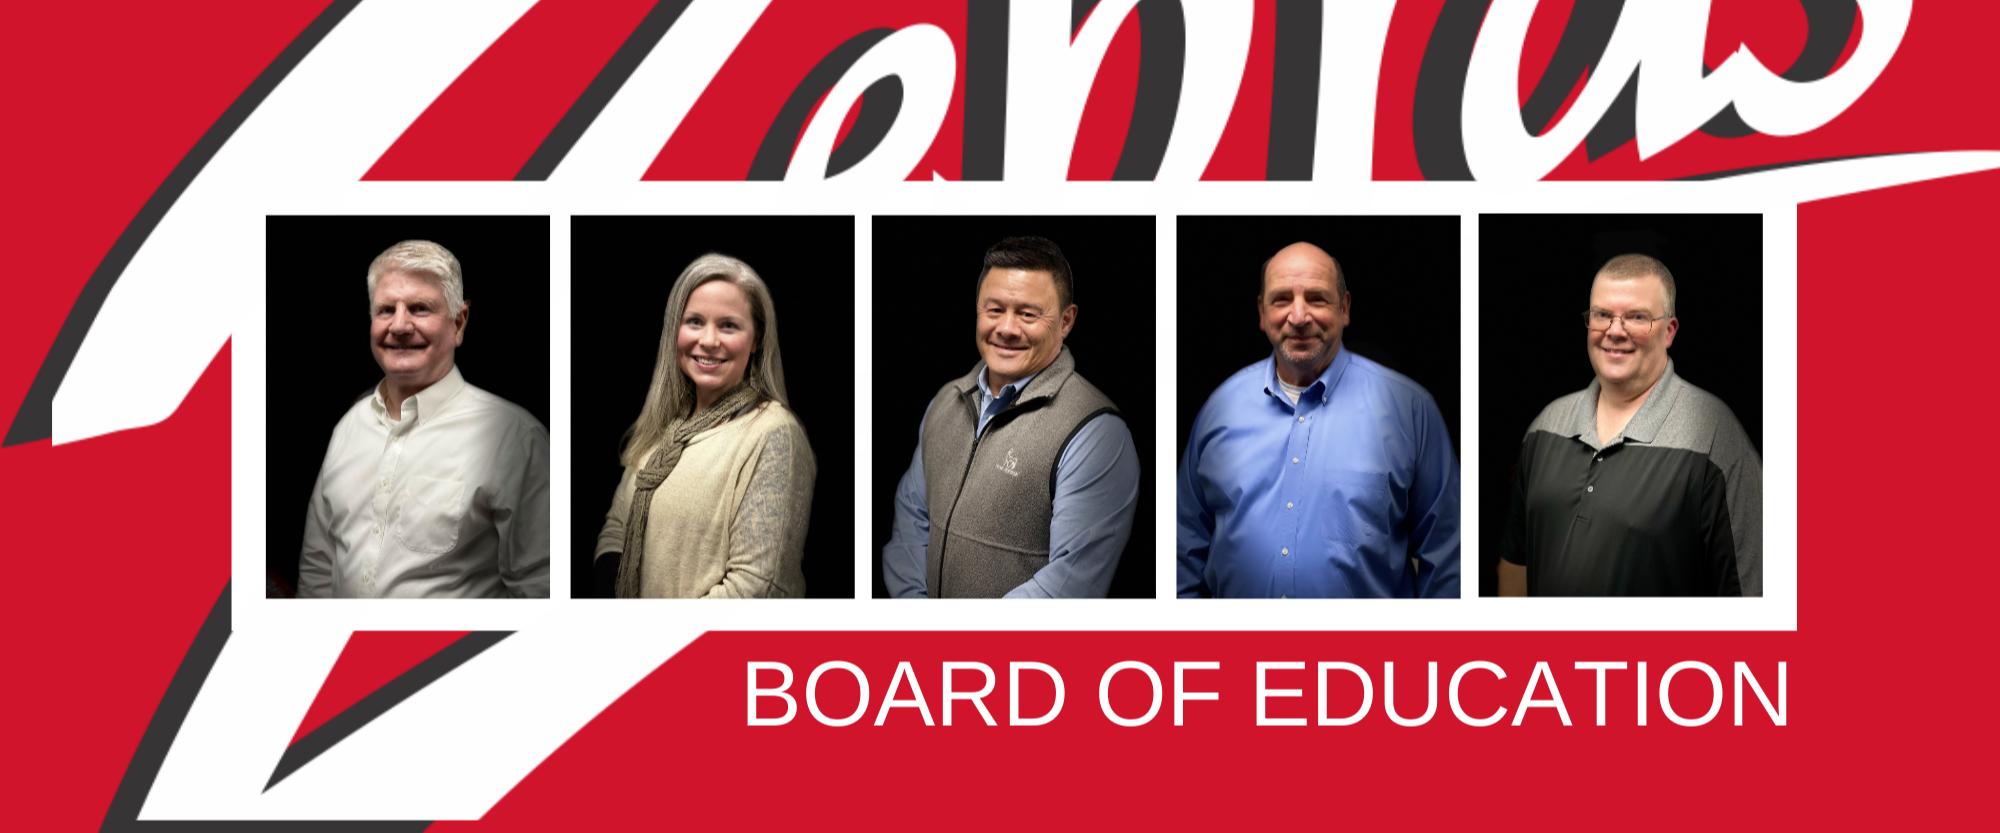 photo of board of education members